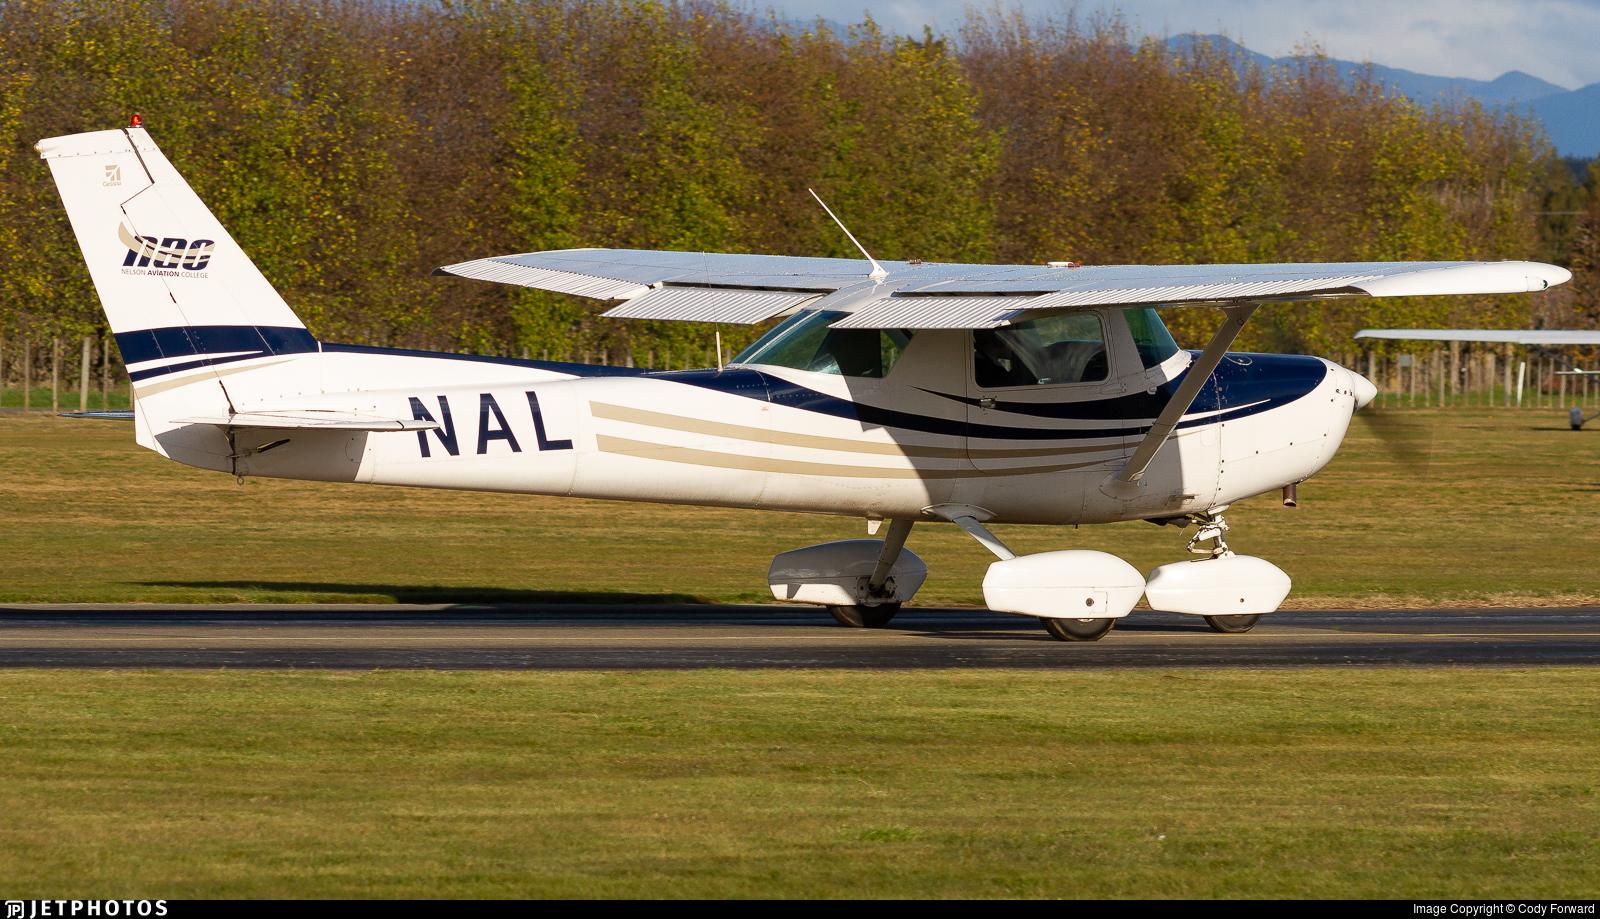 ZK-NAL - Cessna 152 - Nelson Aviation College